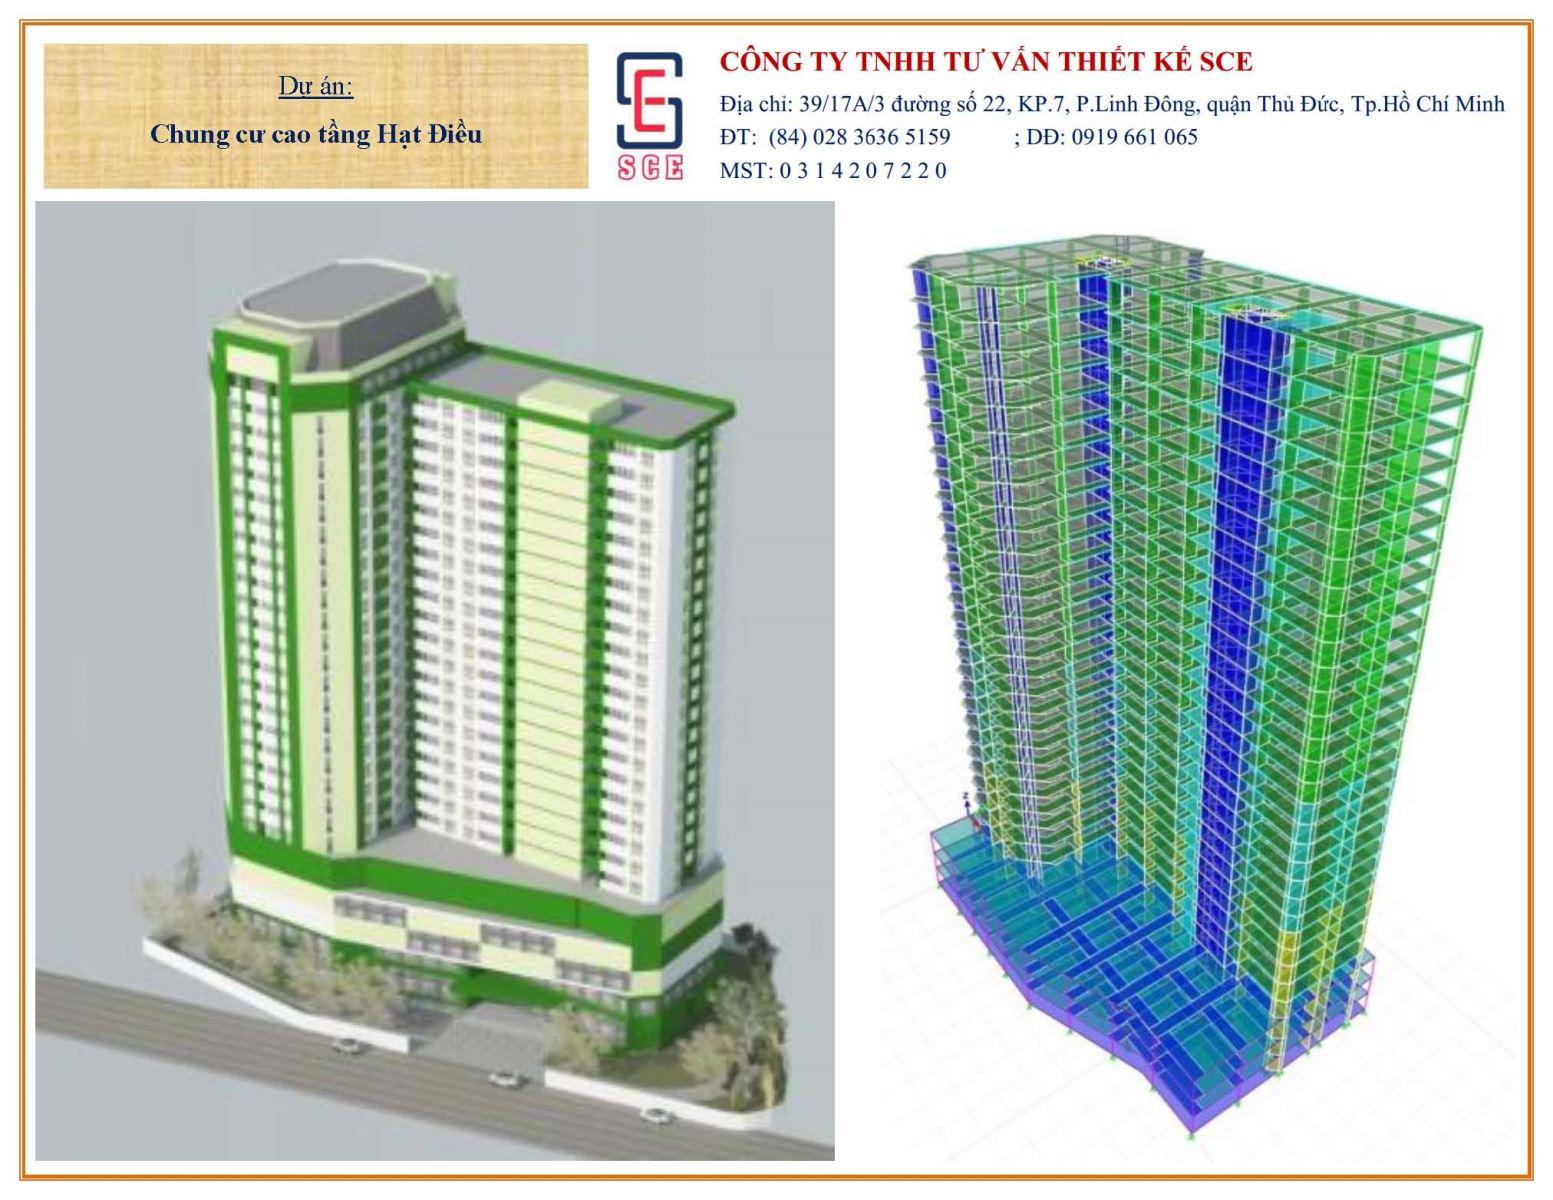 Hight-Rise Apartment Building Hat Dieu